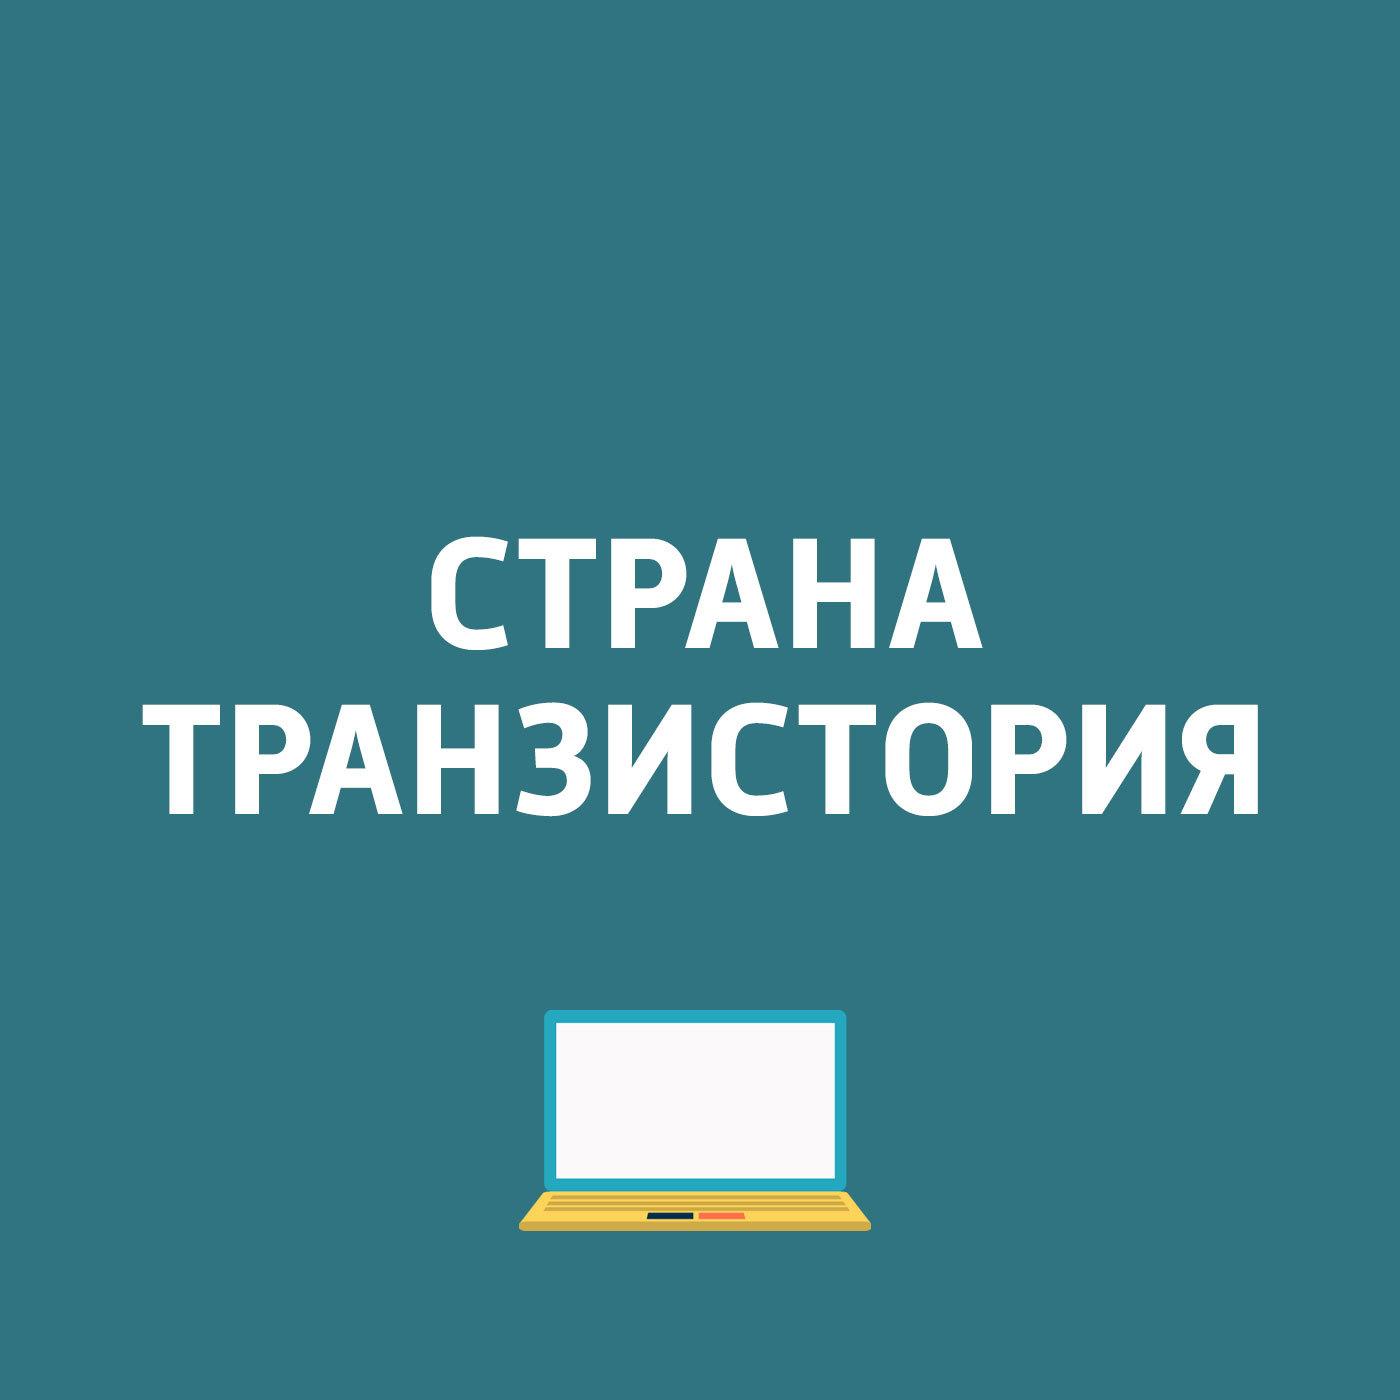 Картаев Павел Бесплатный WhatsApp, блокировка rutracker, киберпонедельник антивирус rutracker